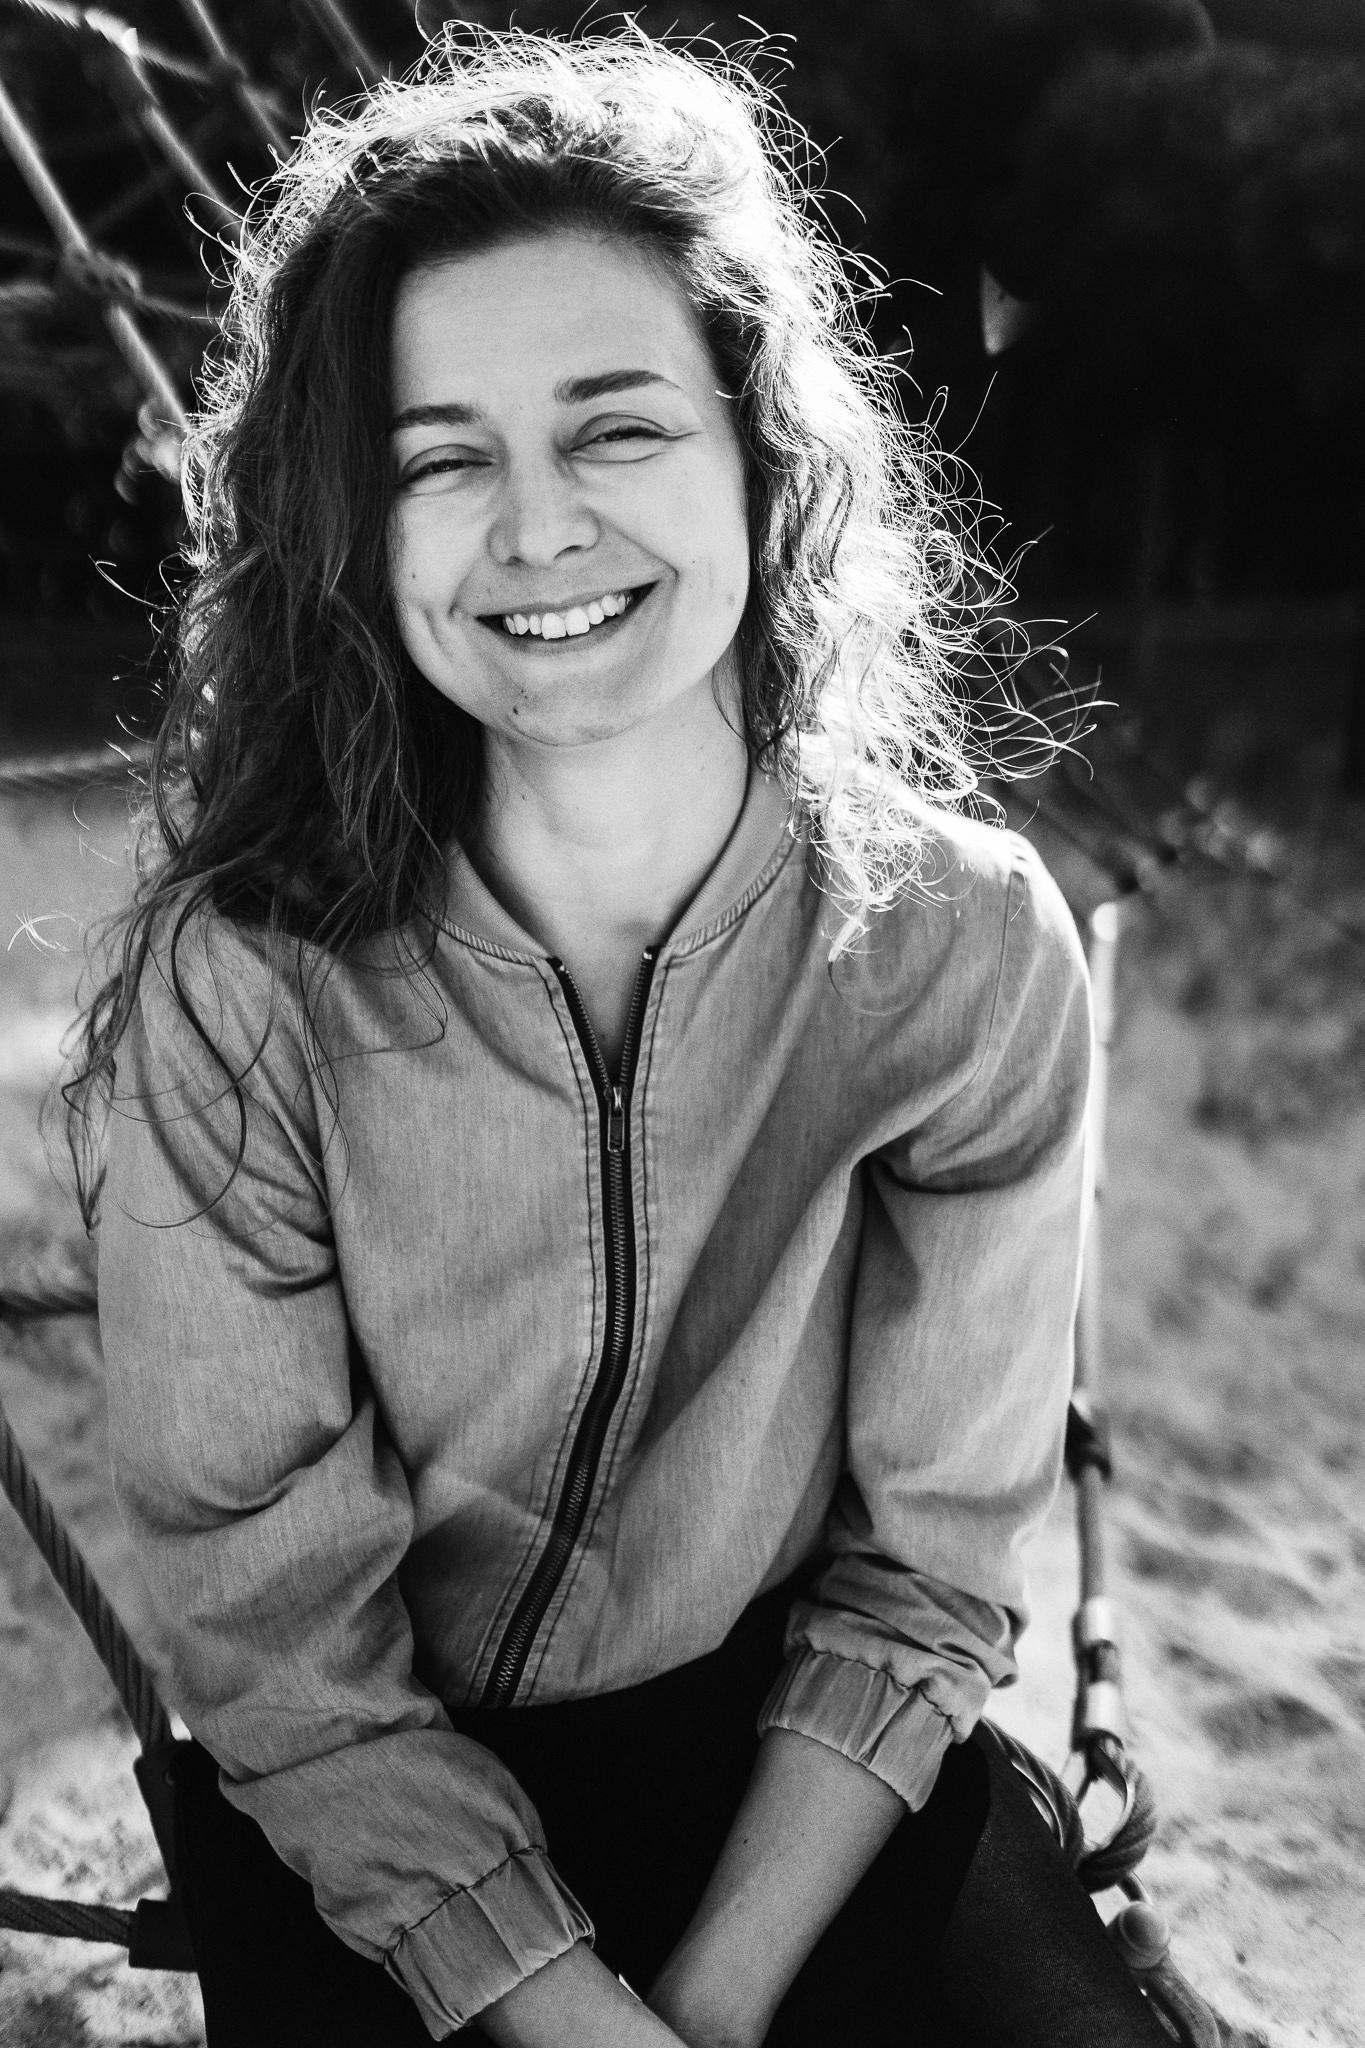 fotografia portretowa Ewelina Chatłas